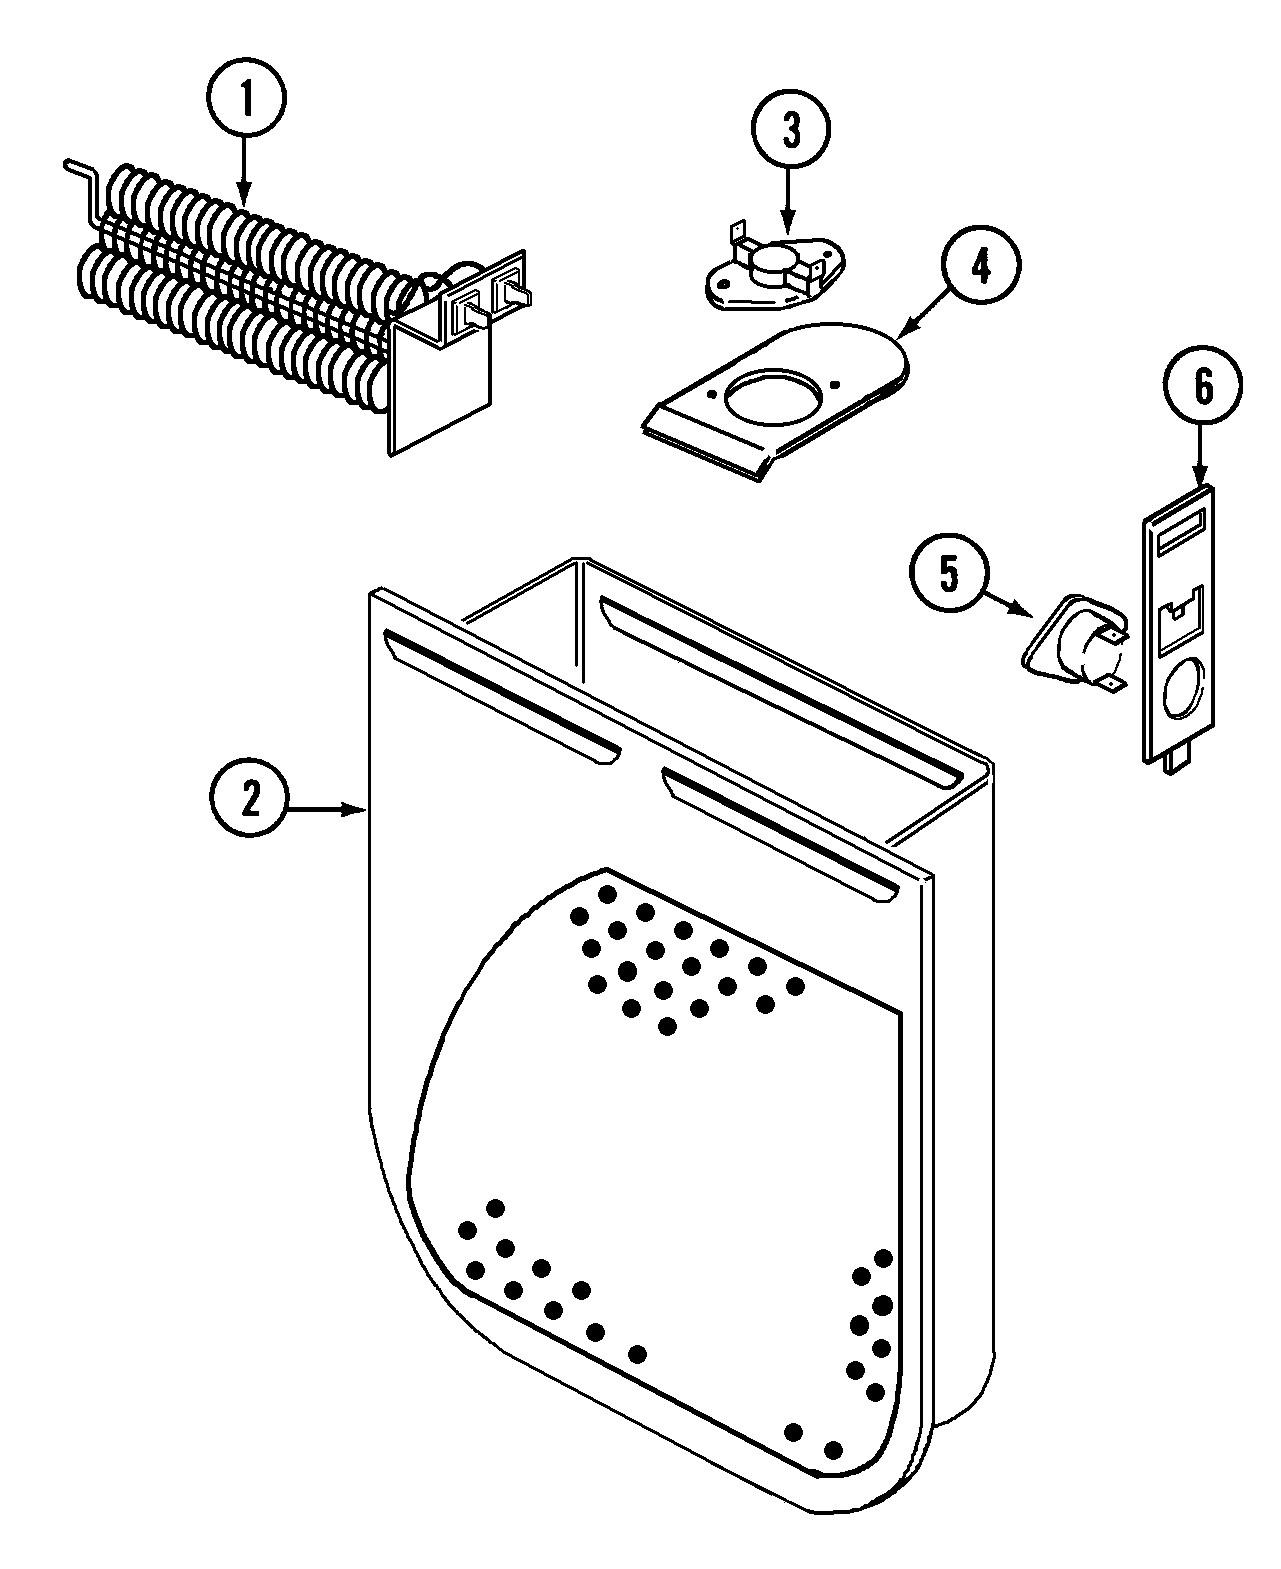 Admiral Dryer Parts Diagram Admiral Model Adg7000aww Residential Dryer Genuine Parts Of Admiral Dryer Parts Diagram